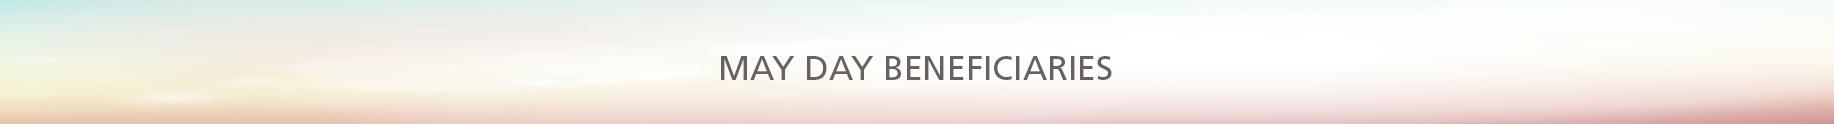 MDC_Beneficiaries_01